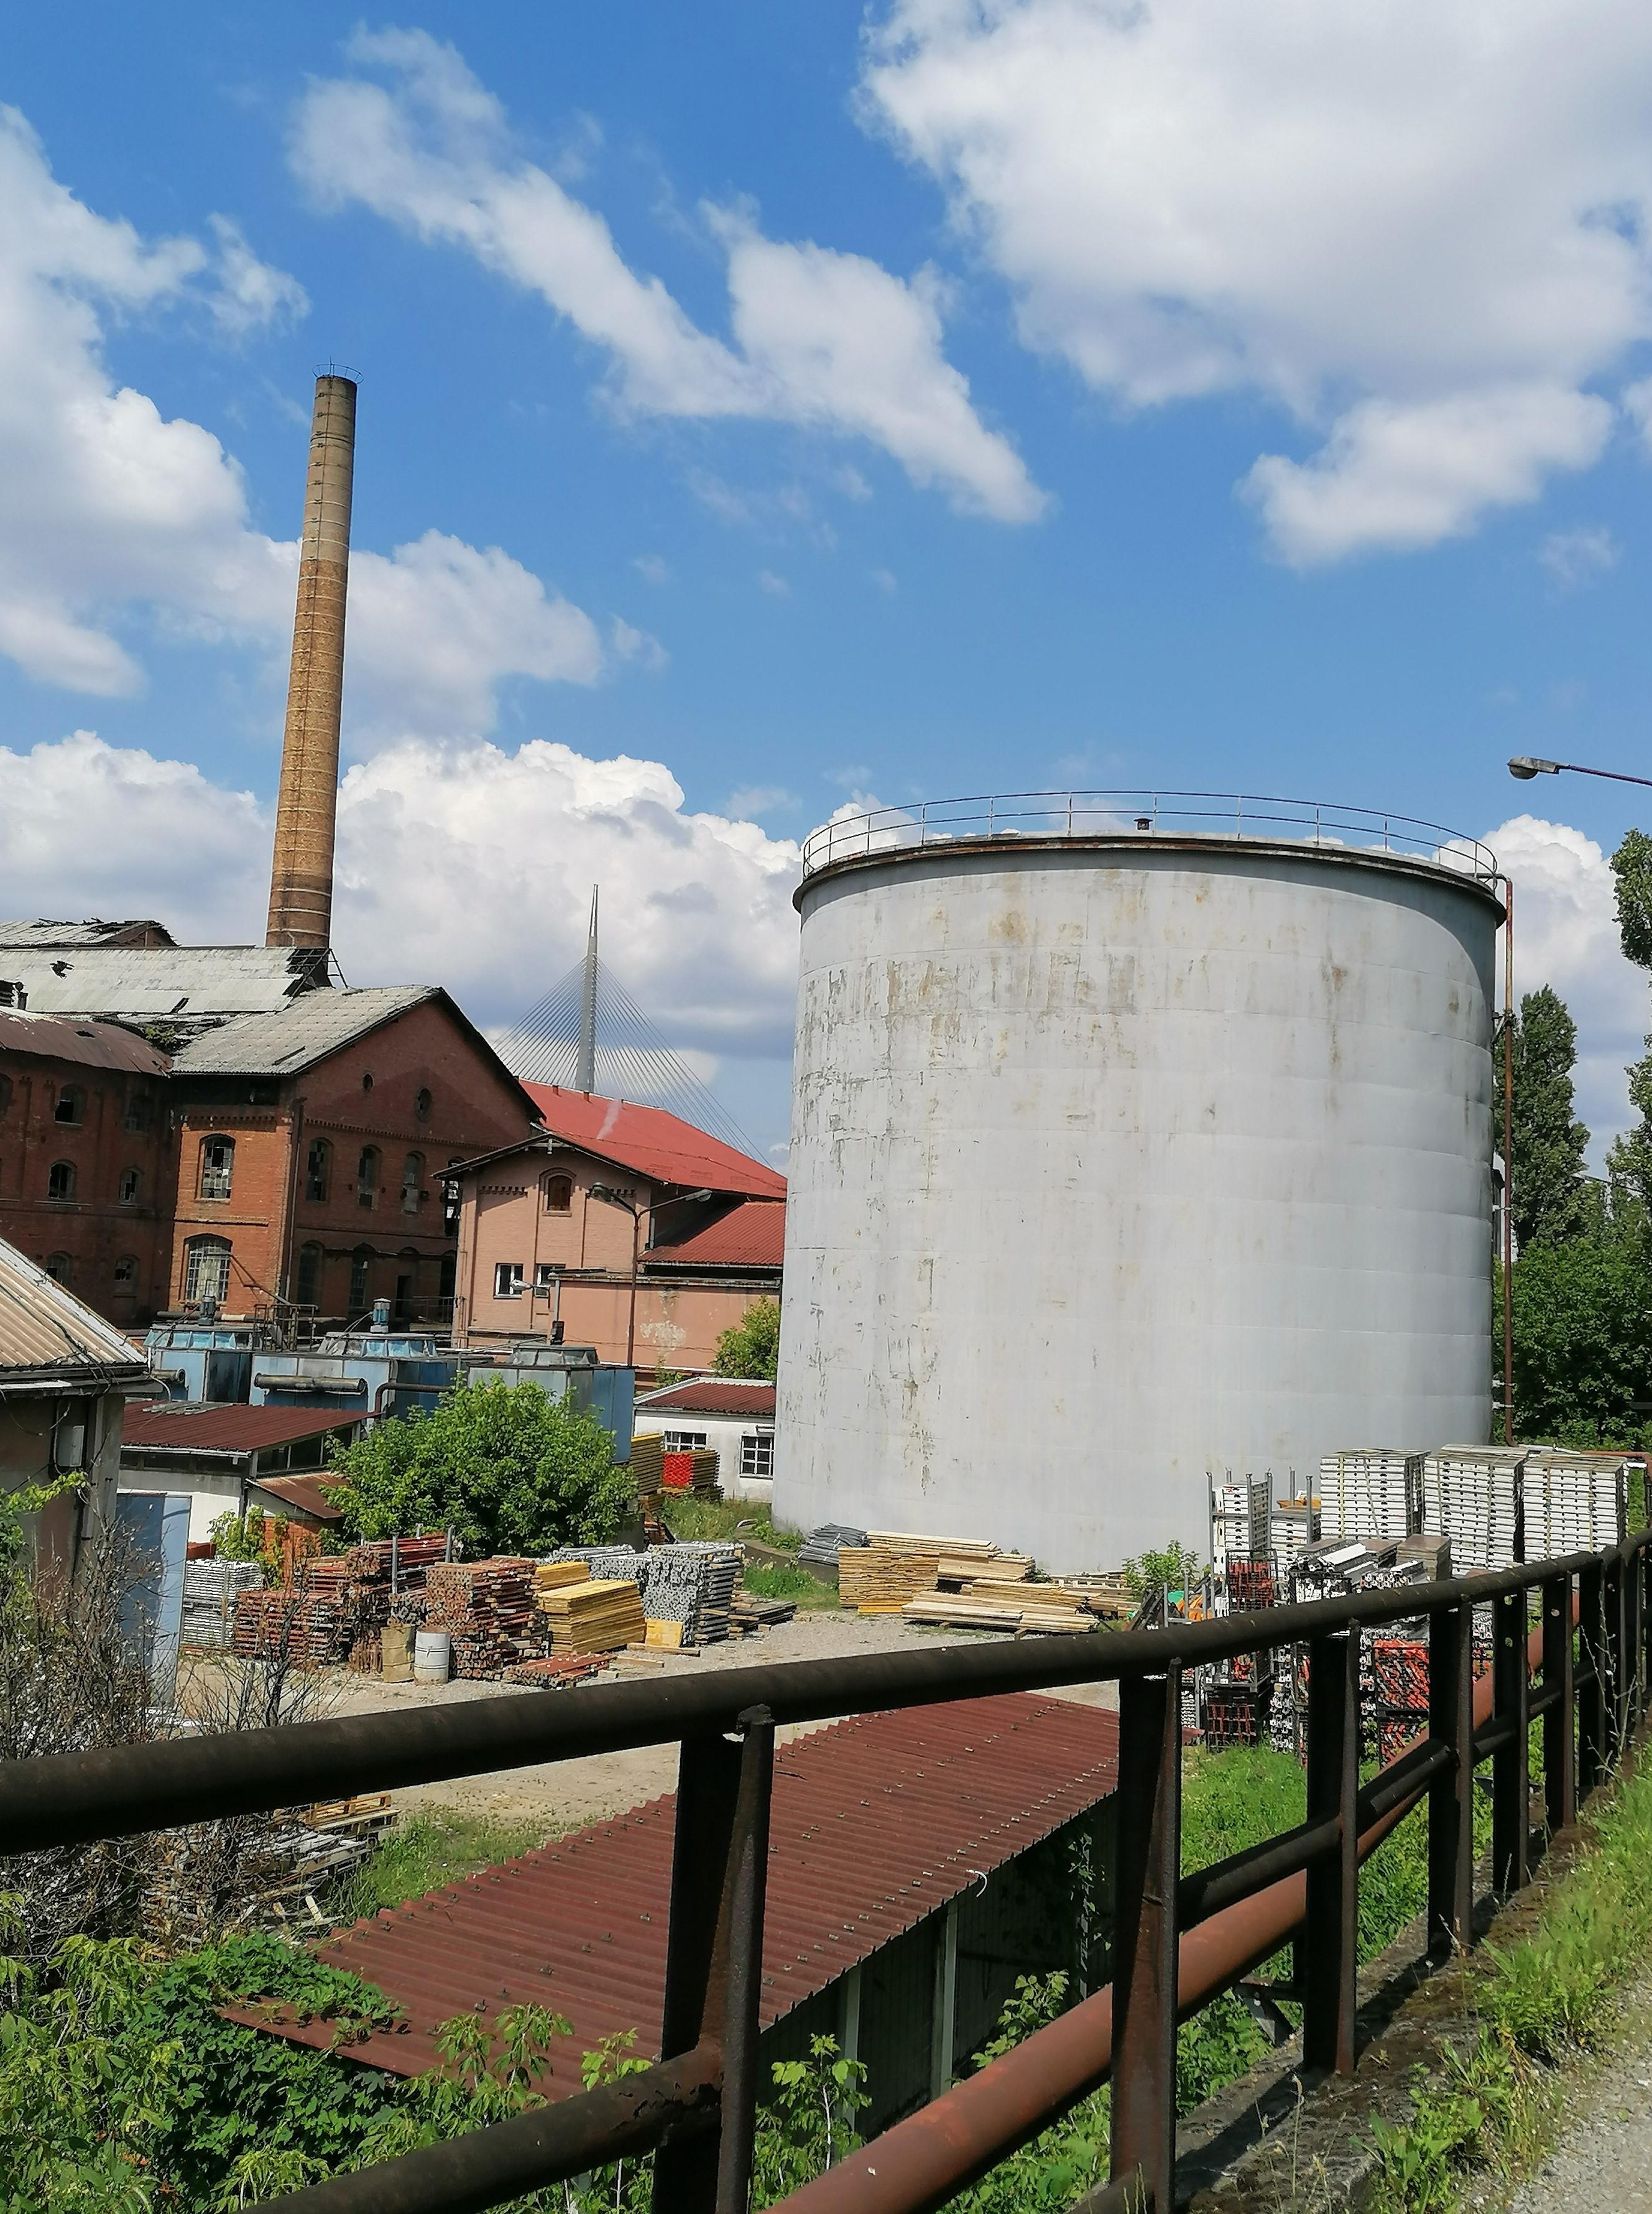 fabrika-alkohola-postrojenje-pan-alko-sistem-6